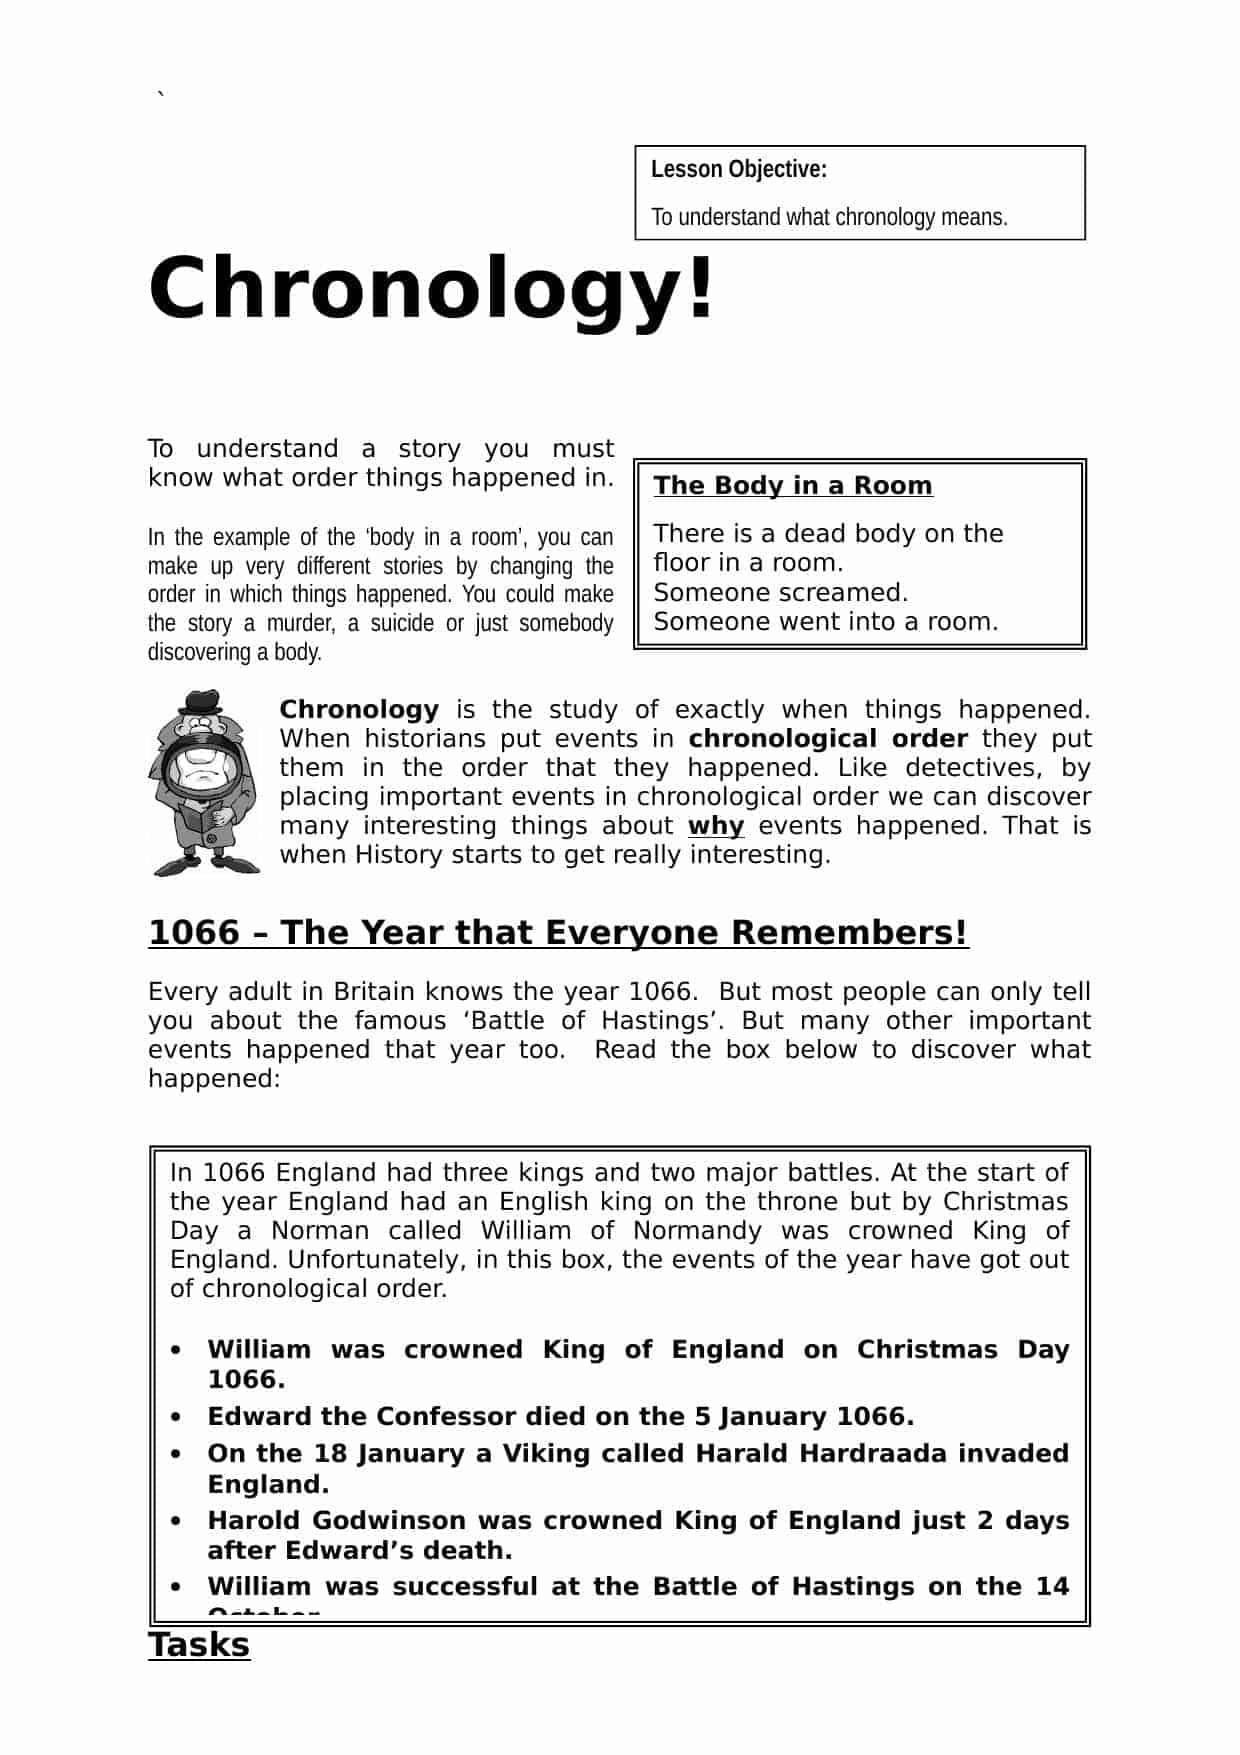 Chronology Worksheet